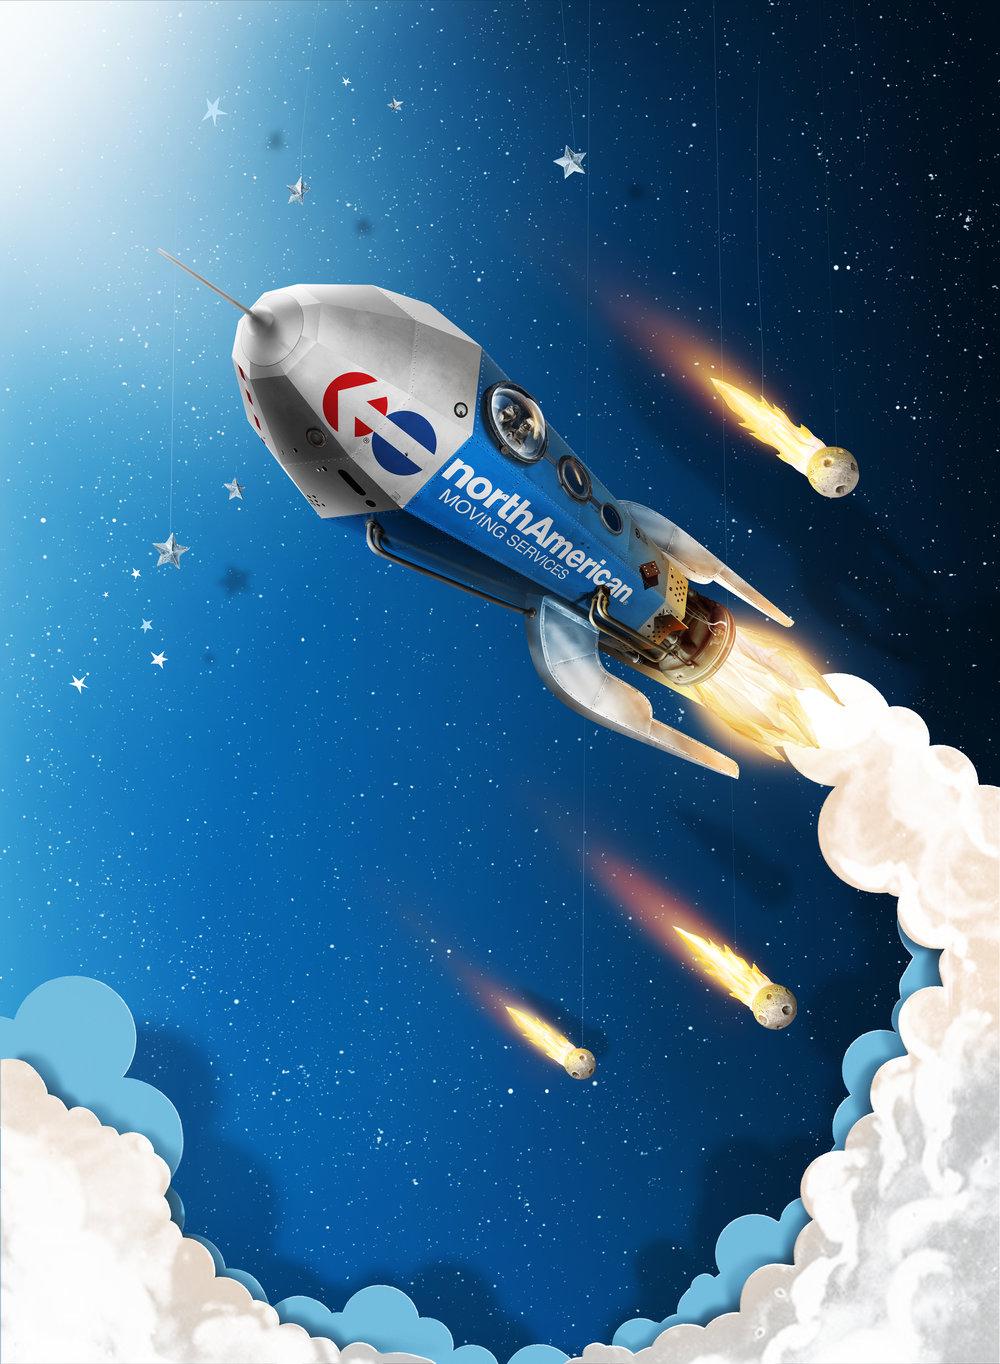 north_american_rocket@465.jpg